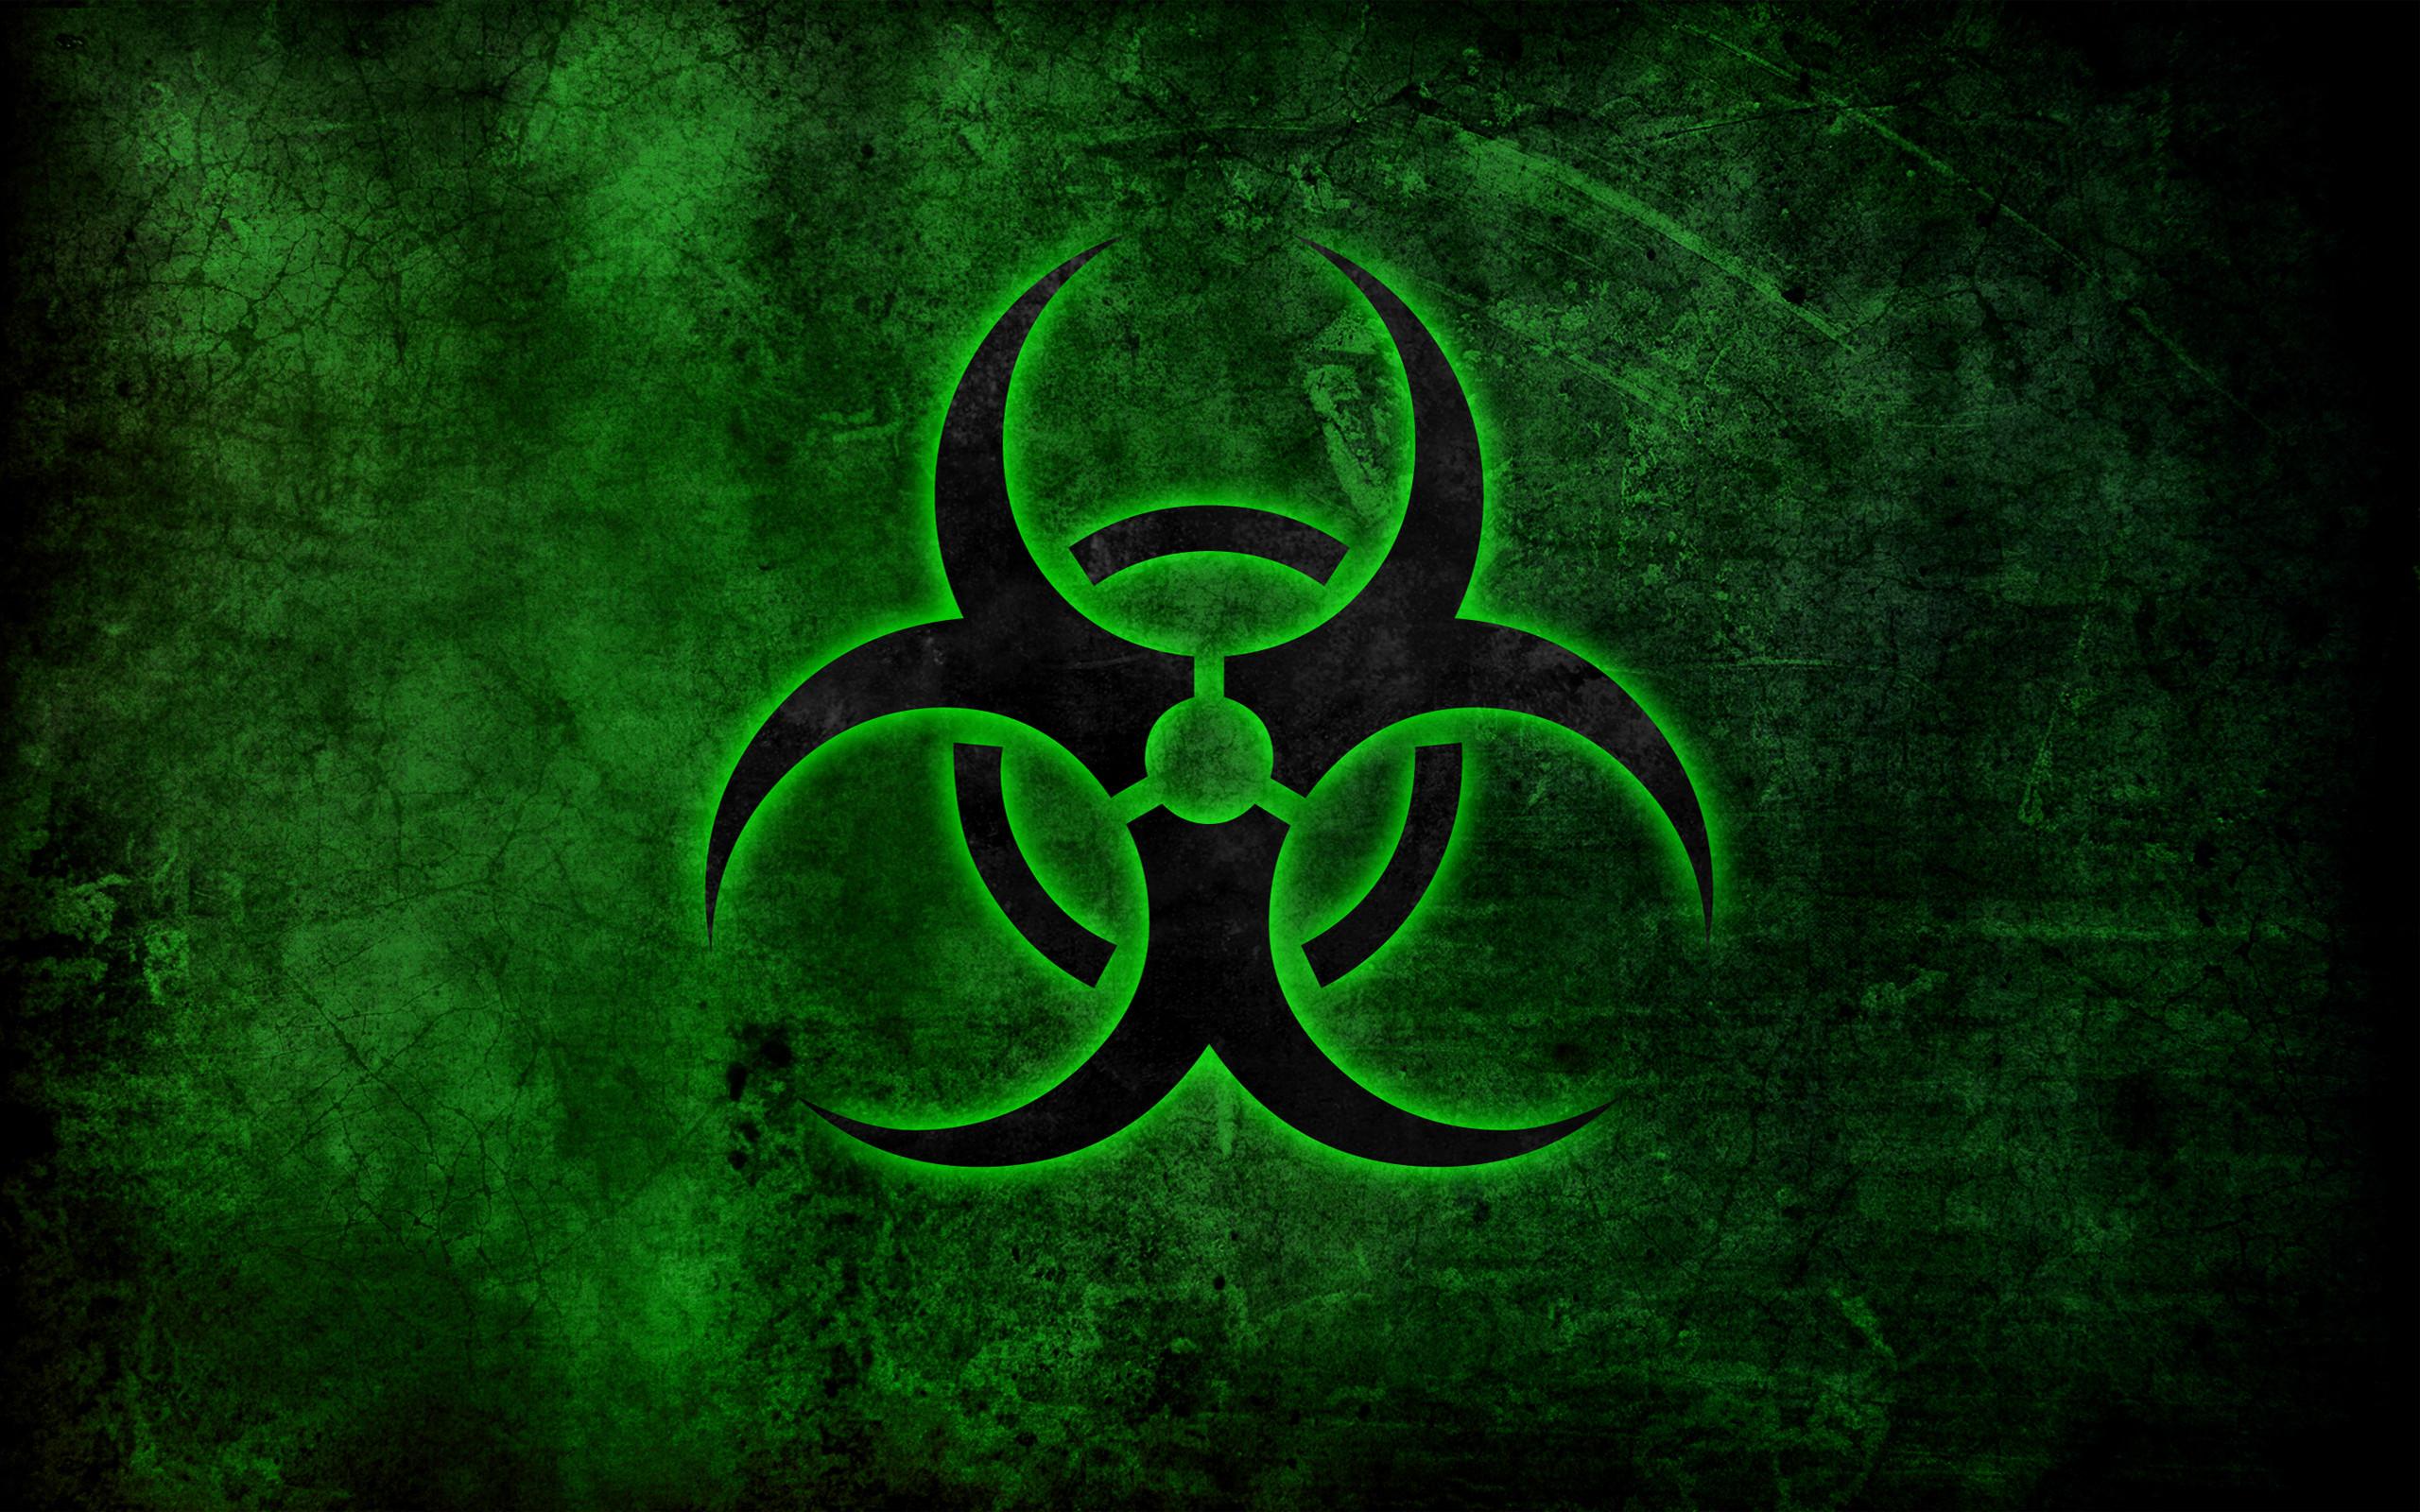 Biohazard Symbol Wallpaper